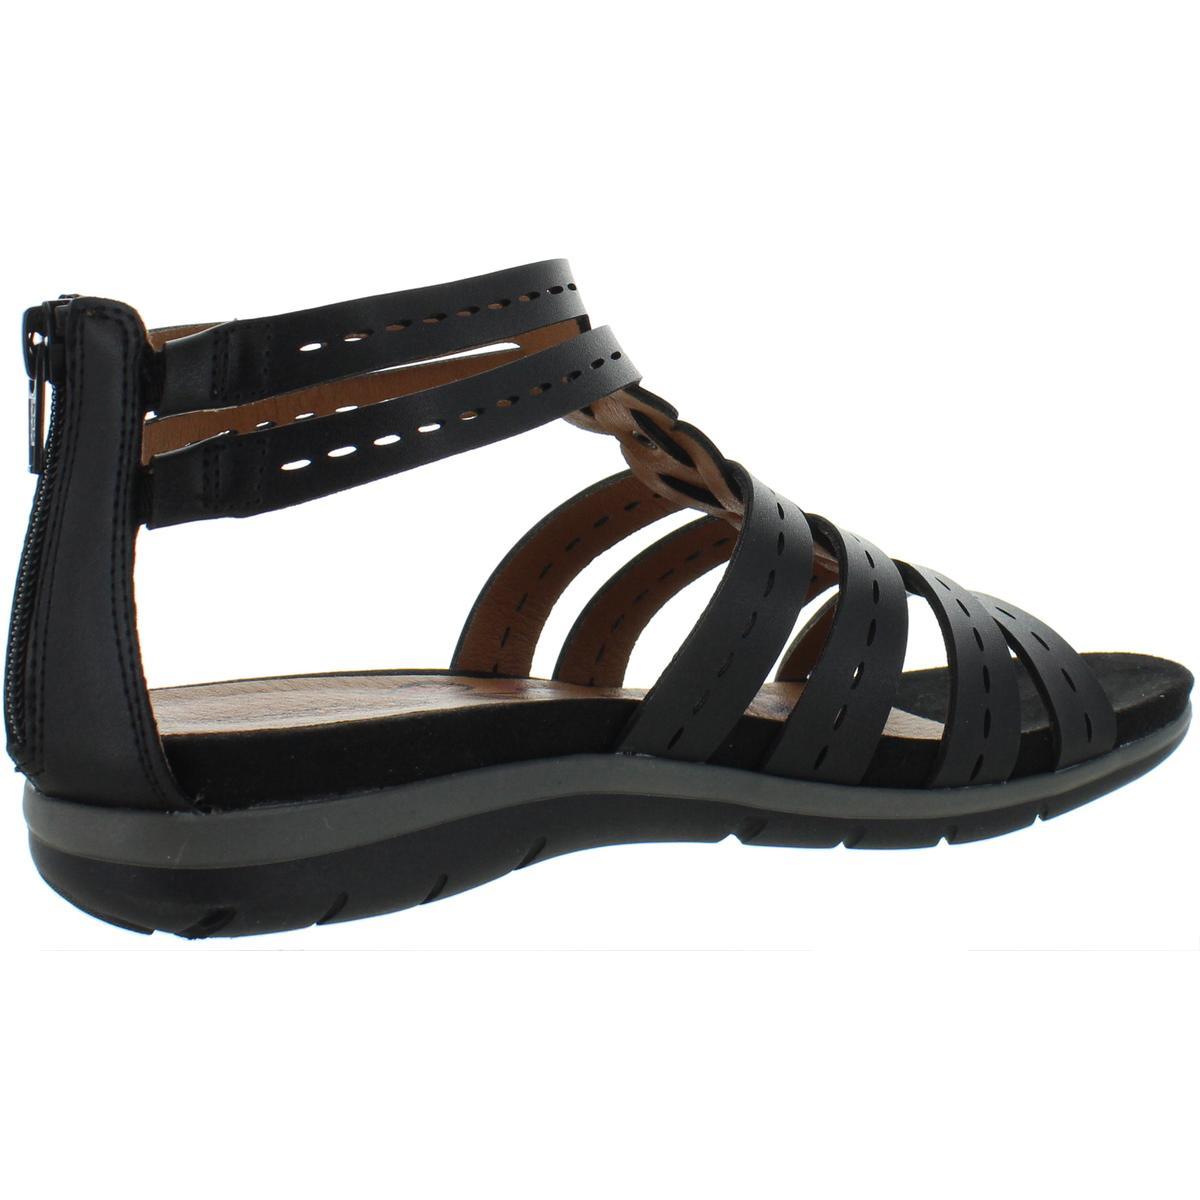 Baretraps-Womens-Kaiser-Solid-Faux-Leather-Flats-Sandals-BHFO-6417 thumbnail 4